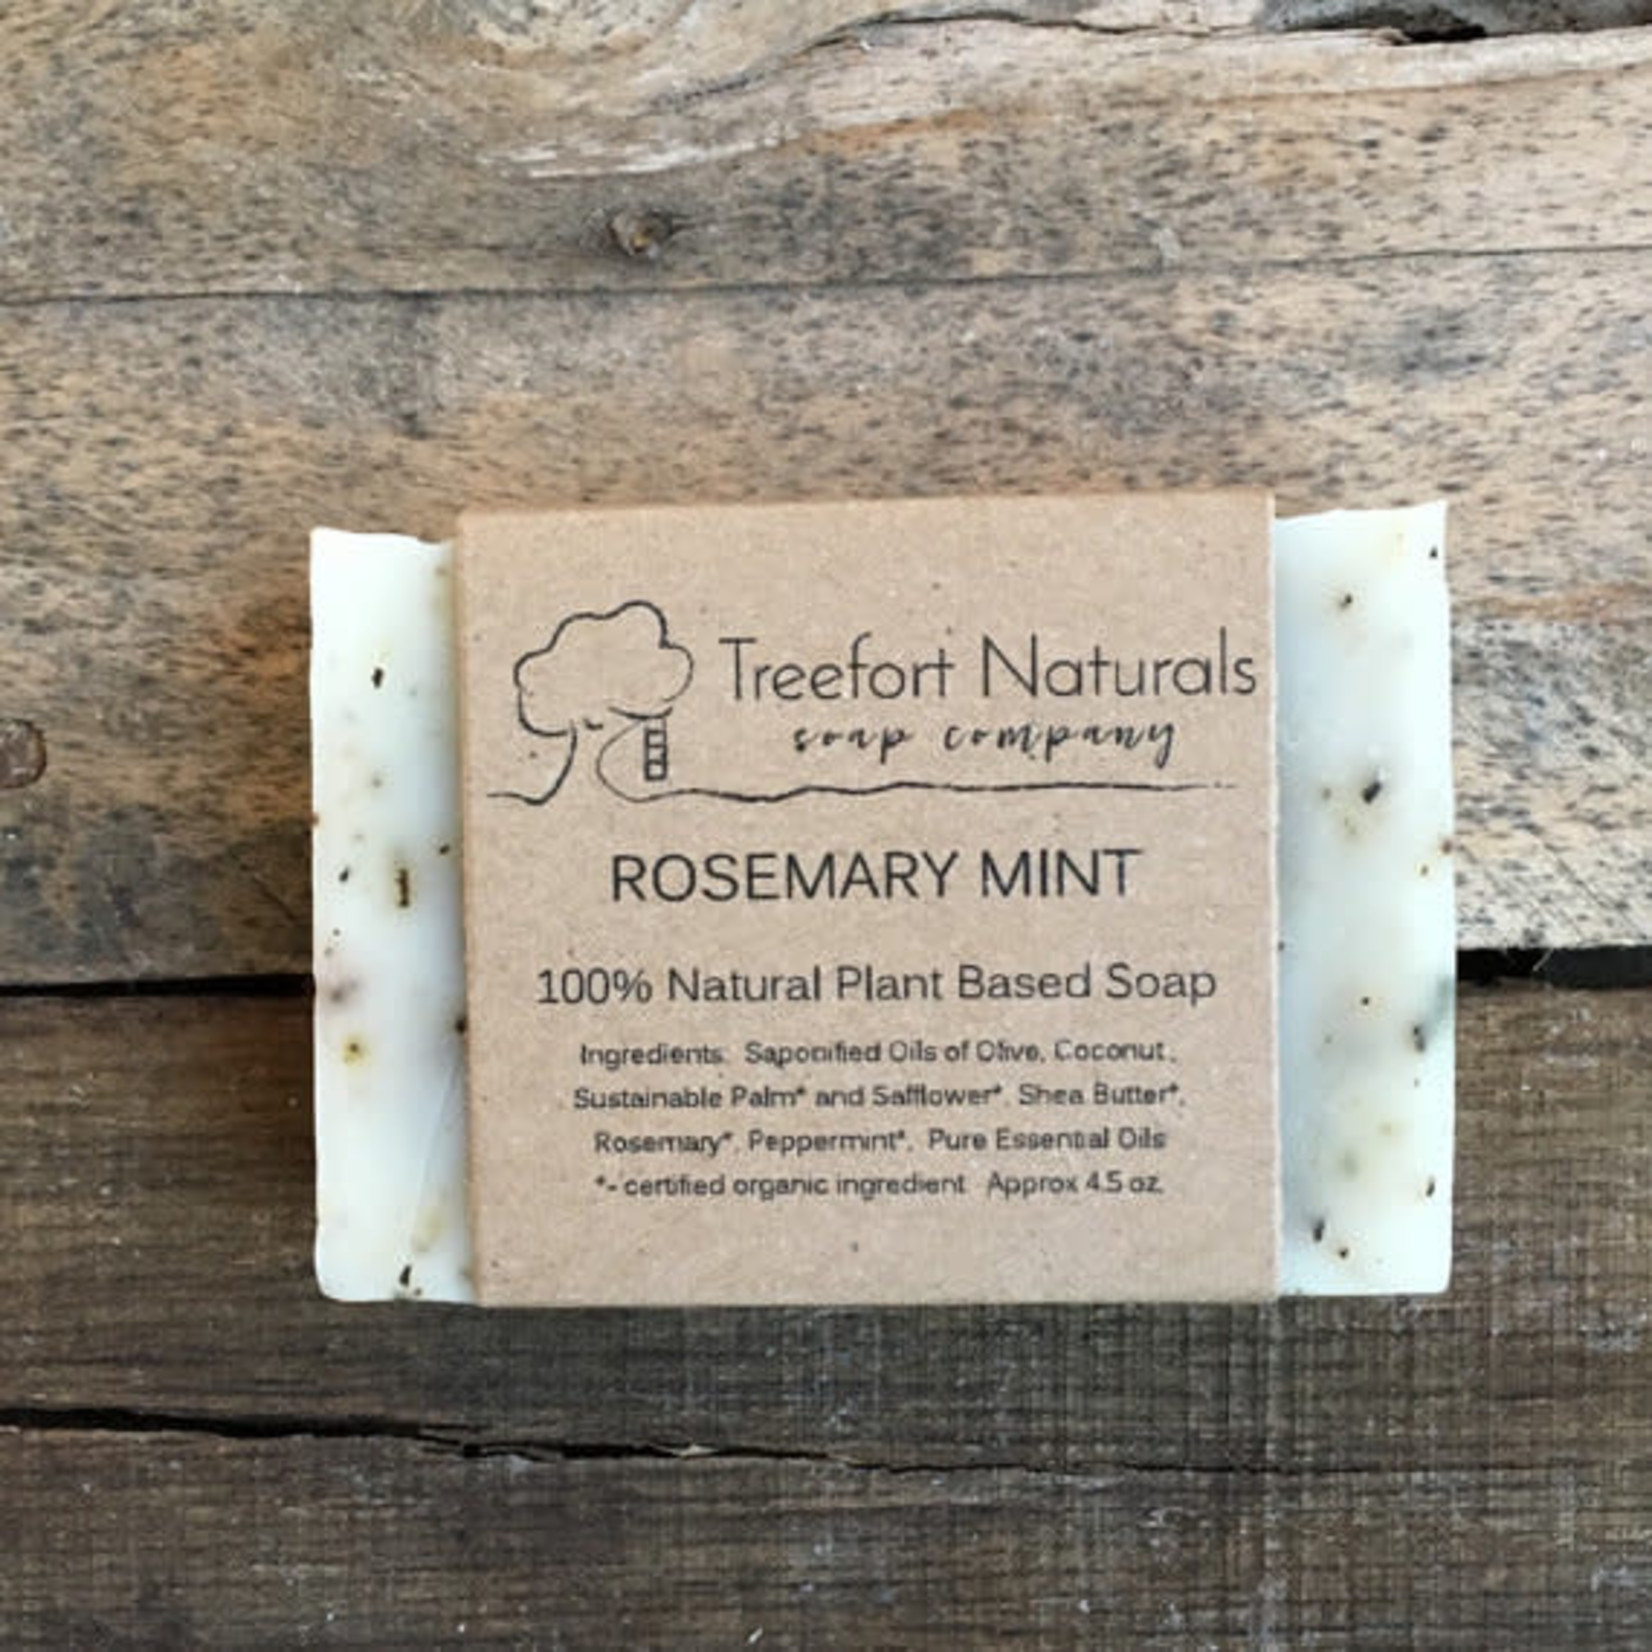 Treefort Naturals Treefort Naturals Rosemary Mint Soap